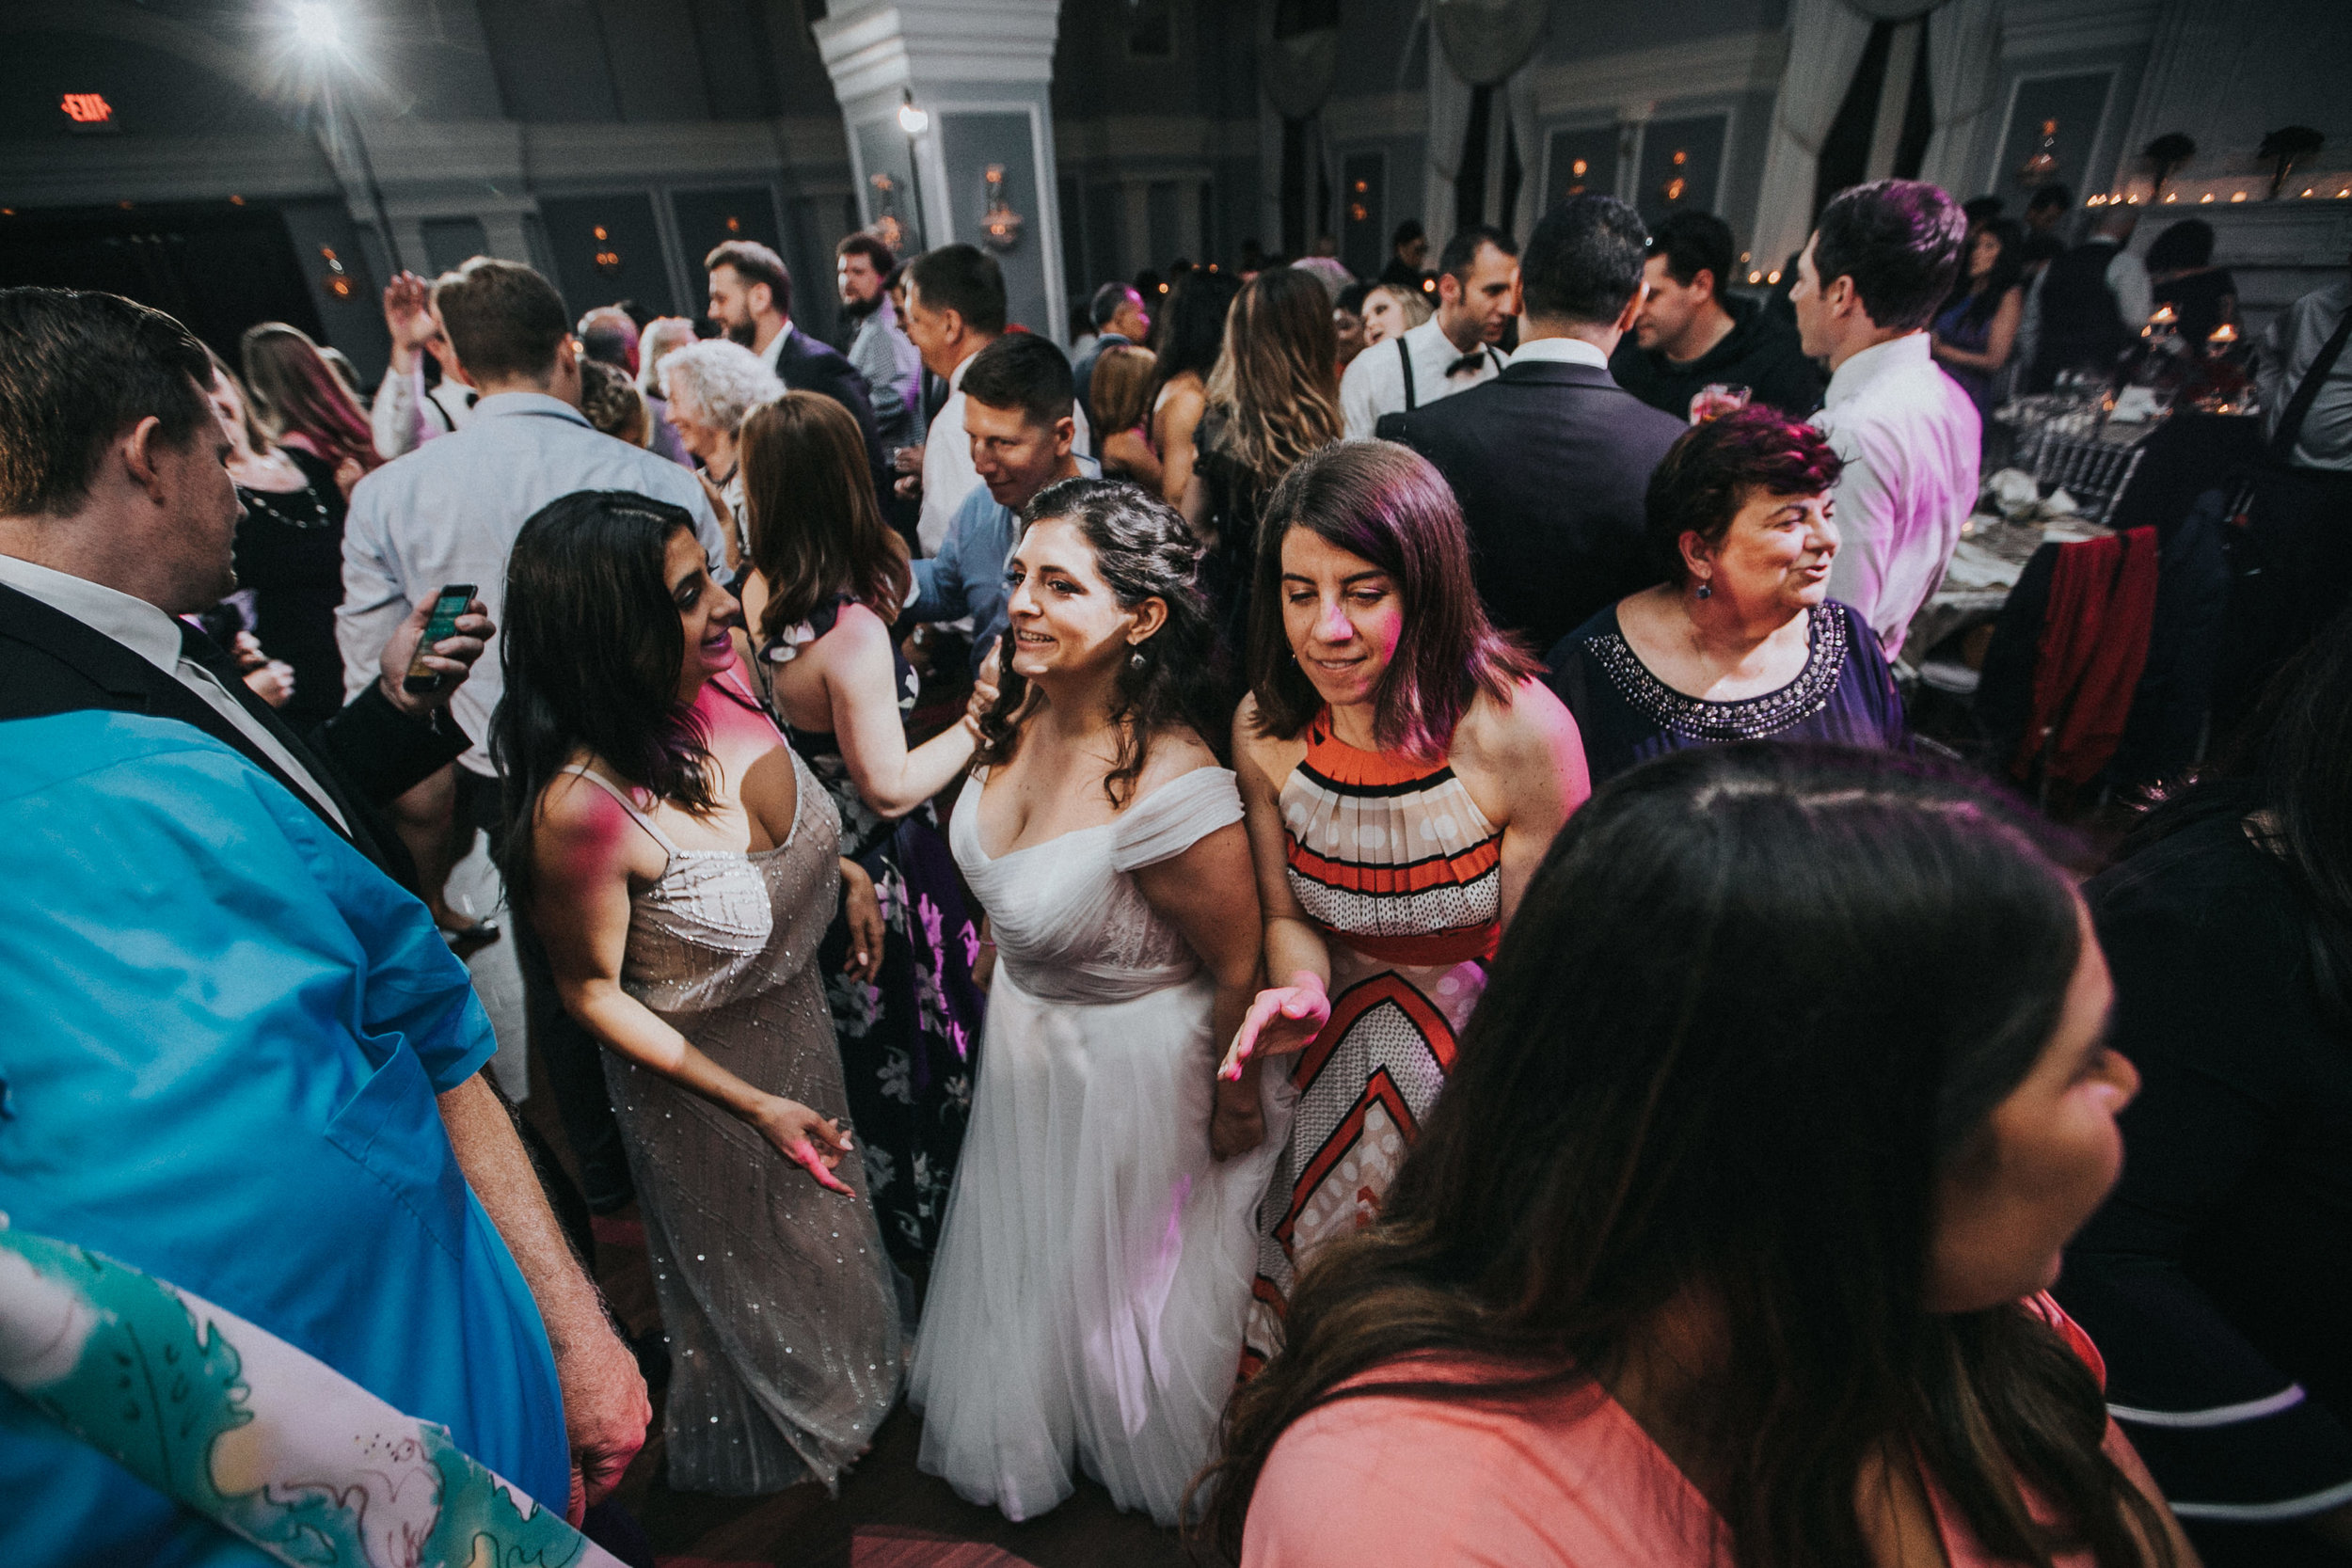 JennaLynnPhotography-NJWeddingPhotographer-Philadelphia-Wedding-ArtsBallroom-Reception-181.jpg